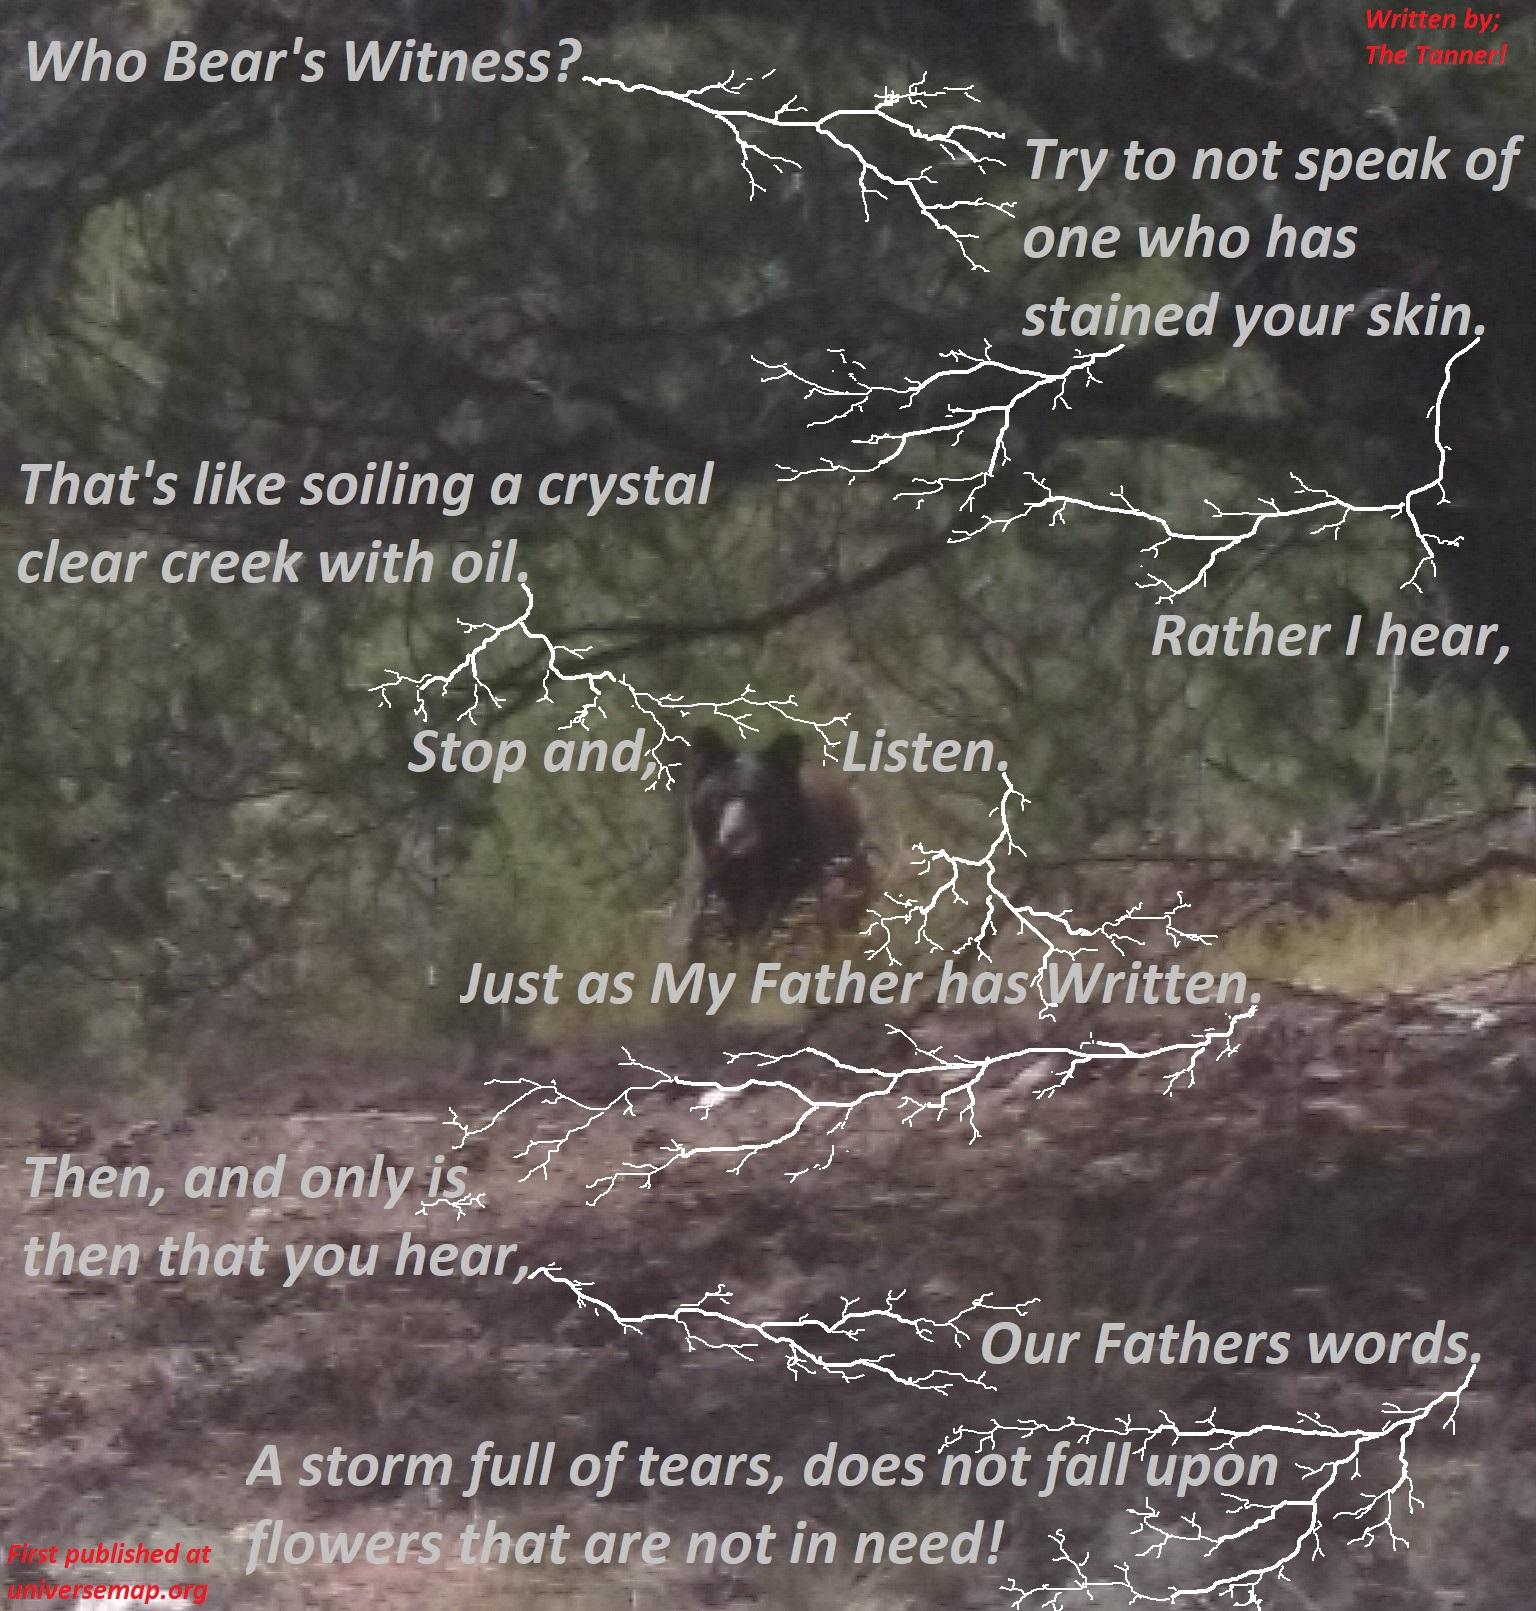 Witness #1 Bear!